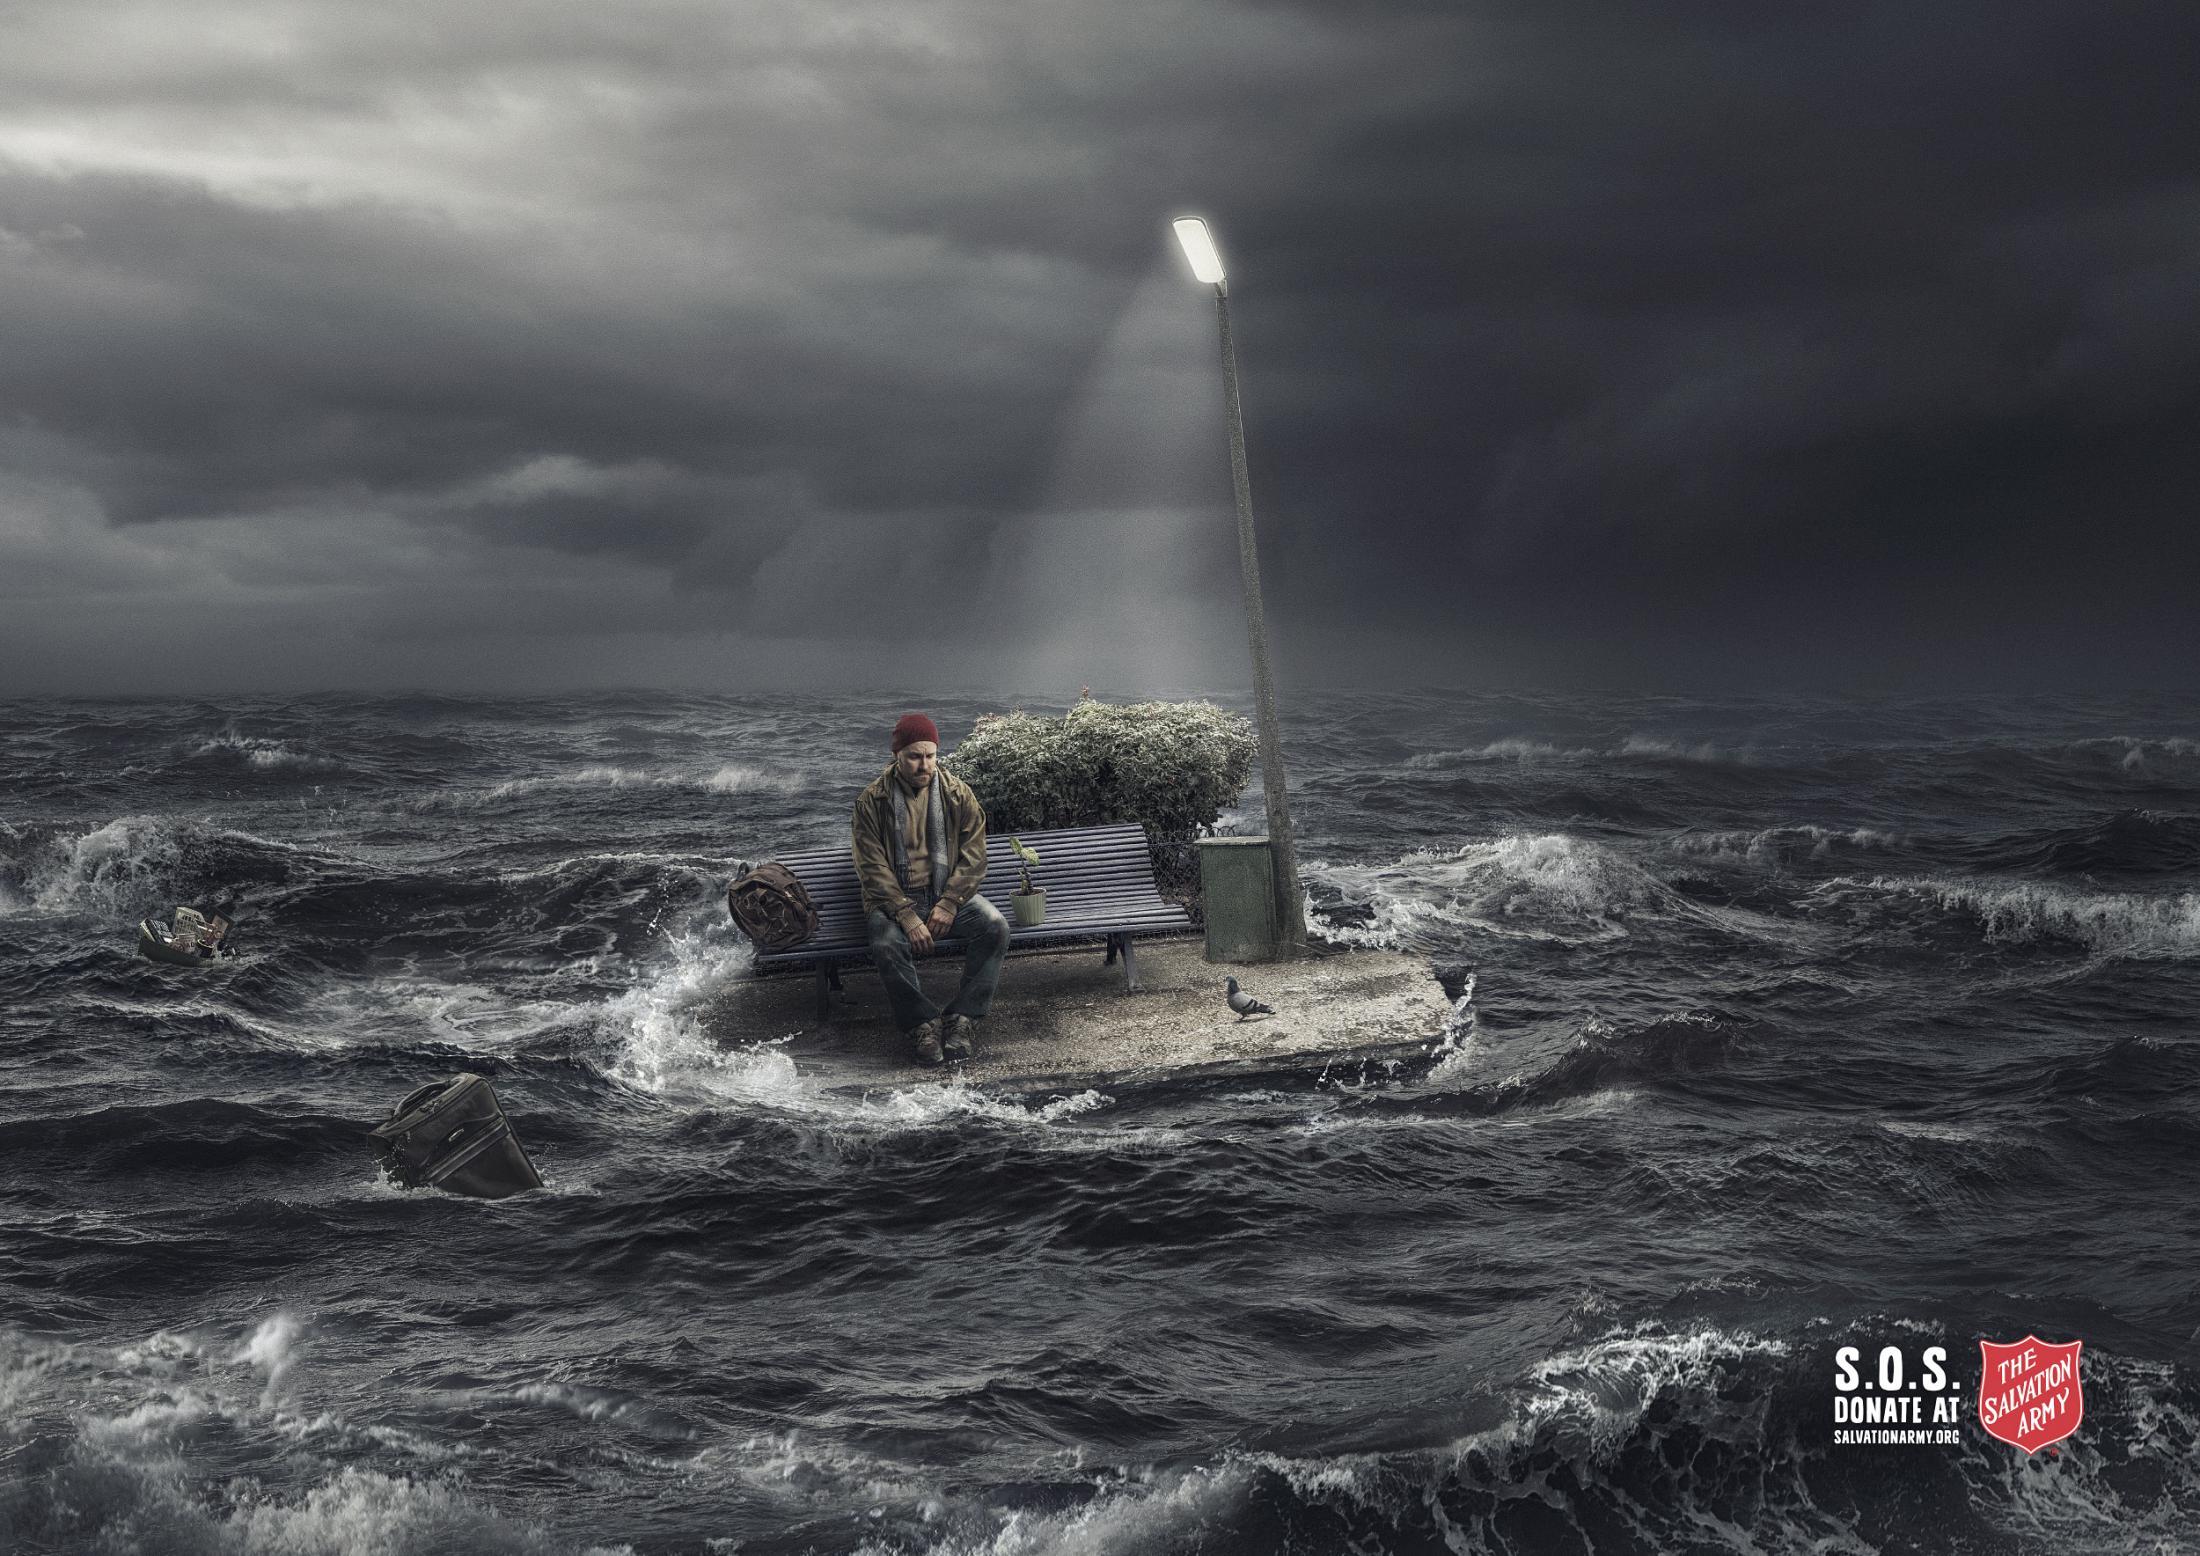 Salvation Army Print Ad - S.O.S. - Man